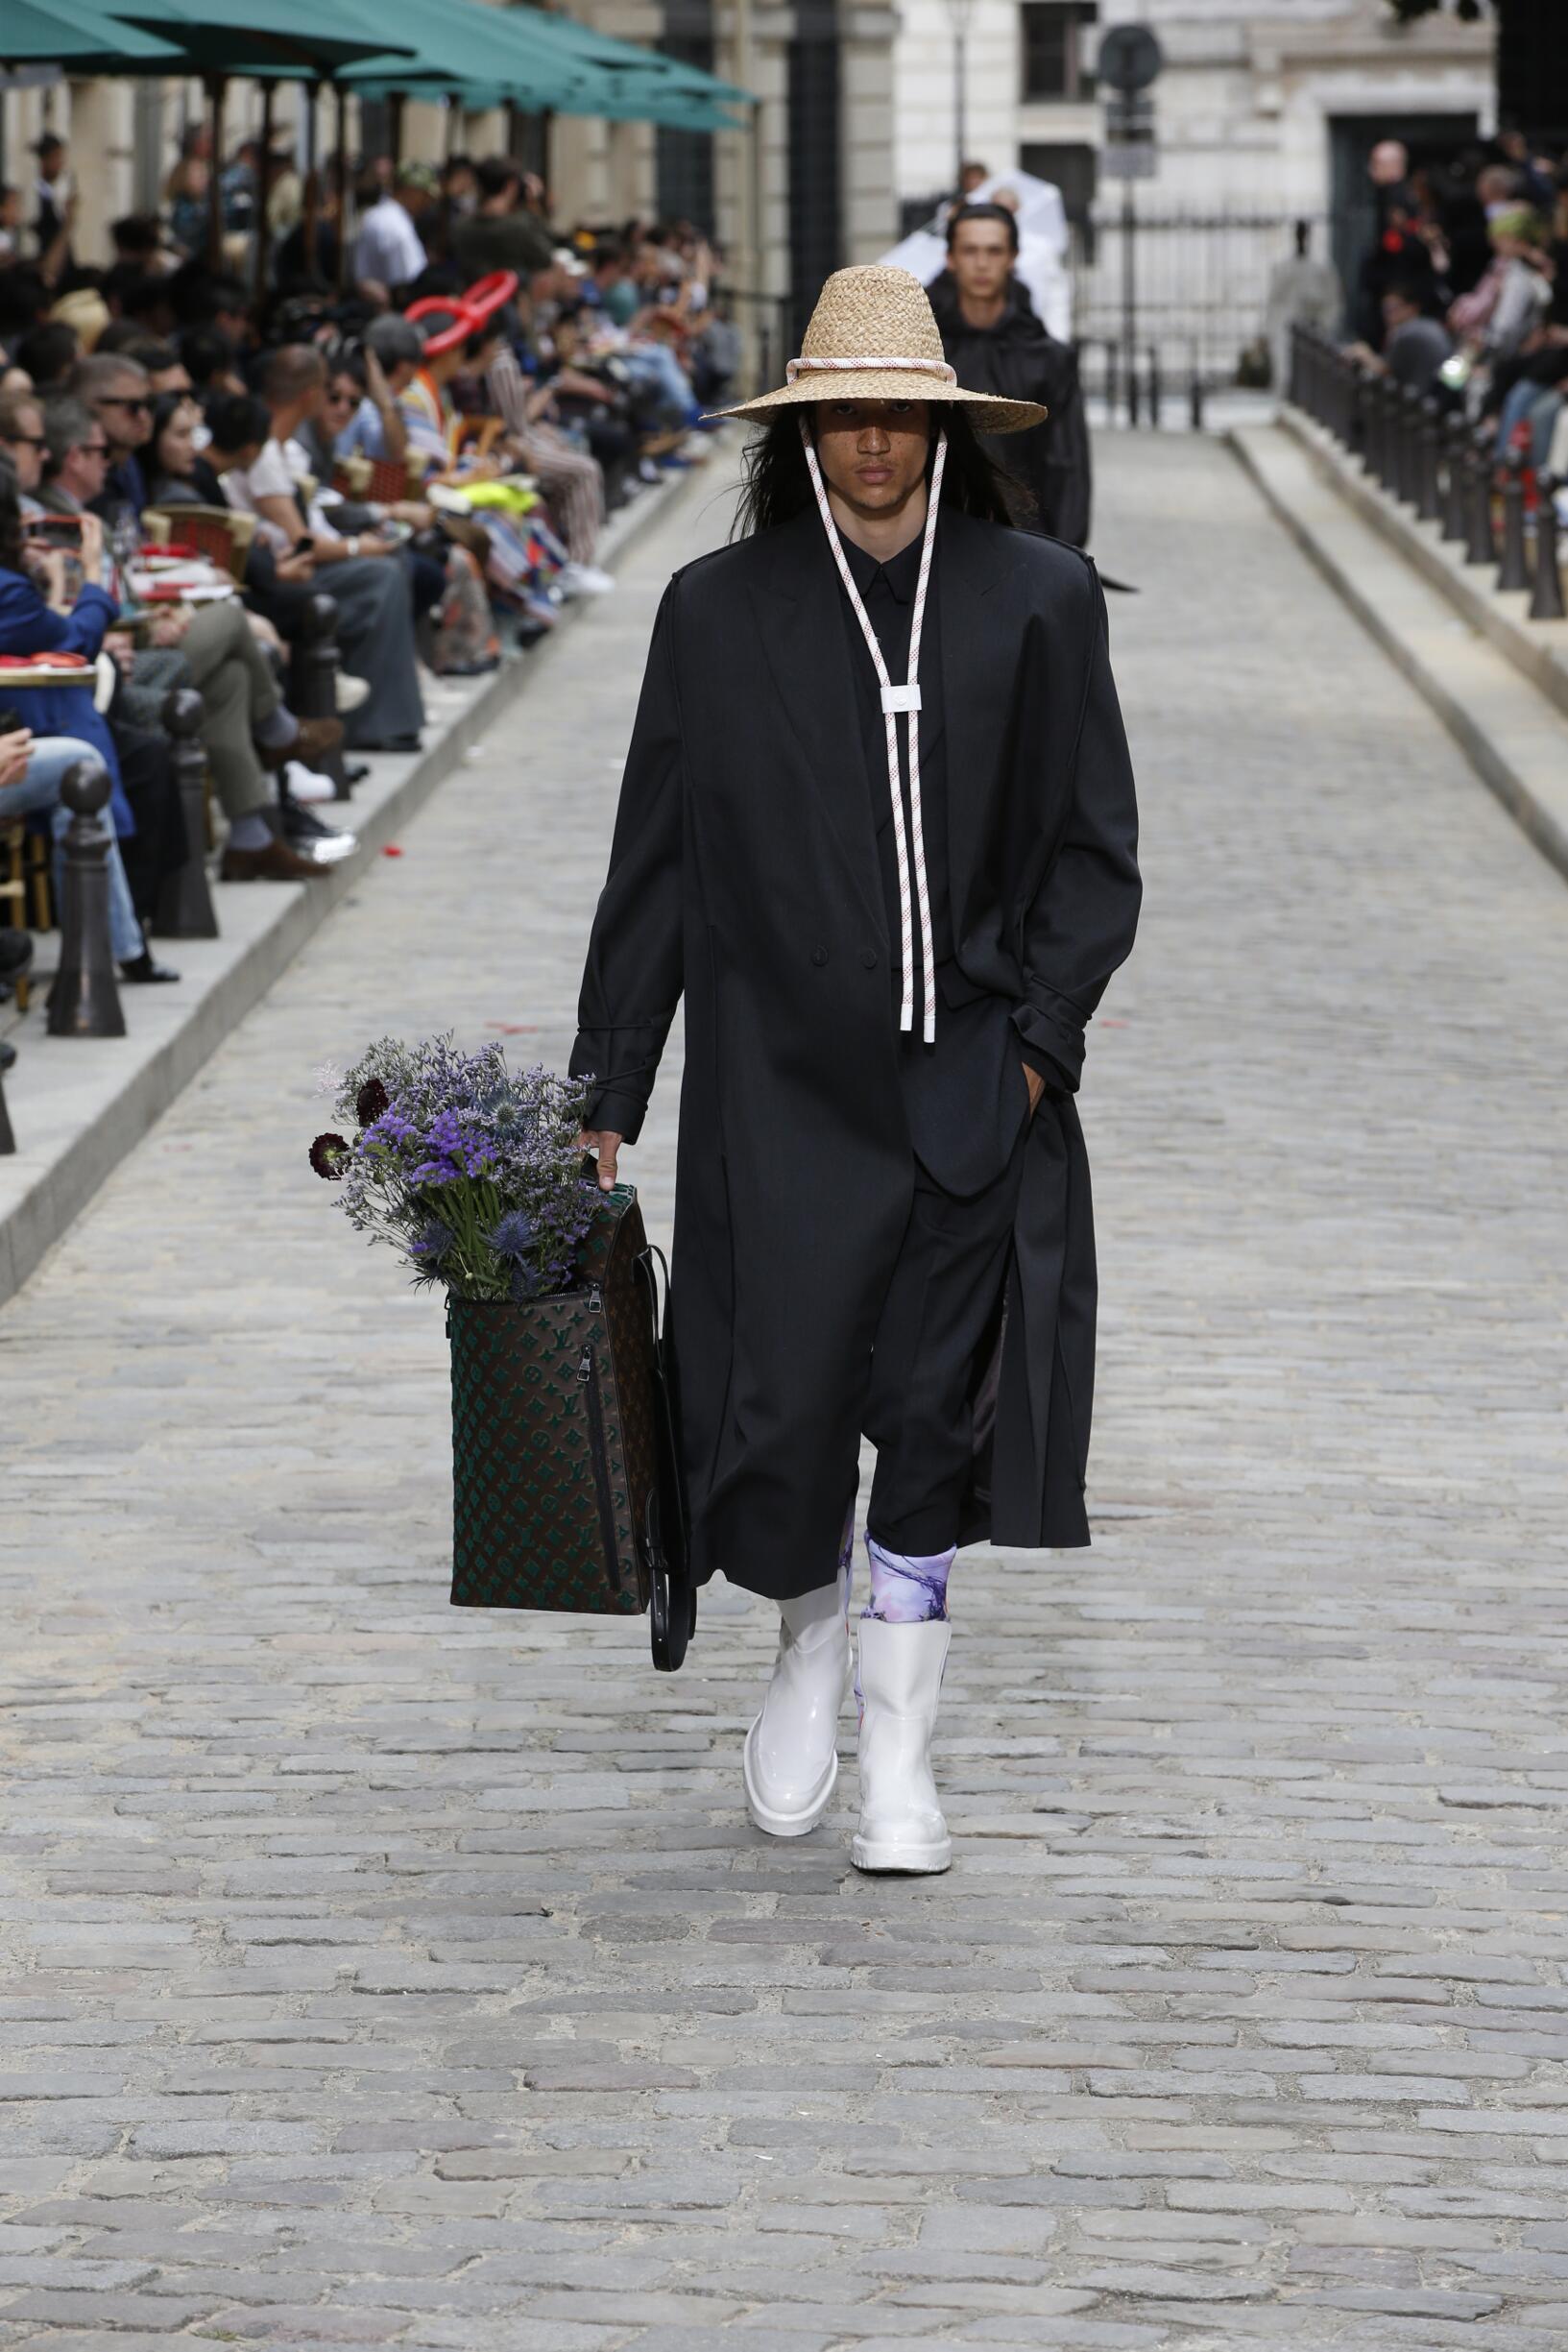 Man SS 2020 Louis Vuitton Show Paris Fashion Week